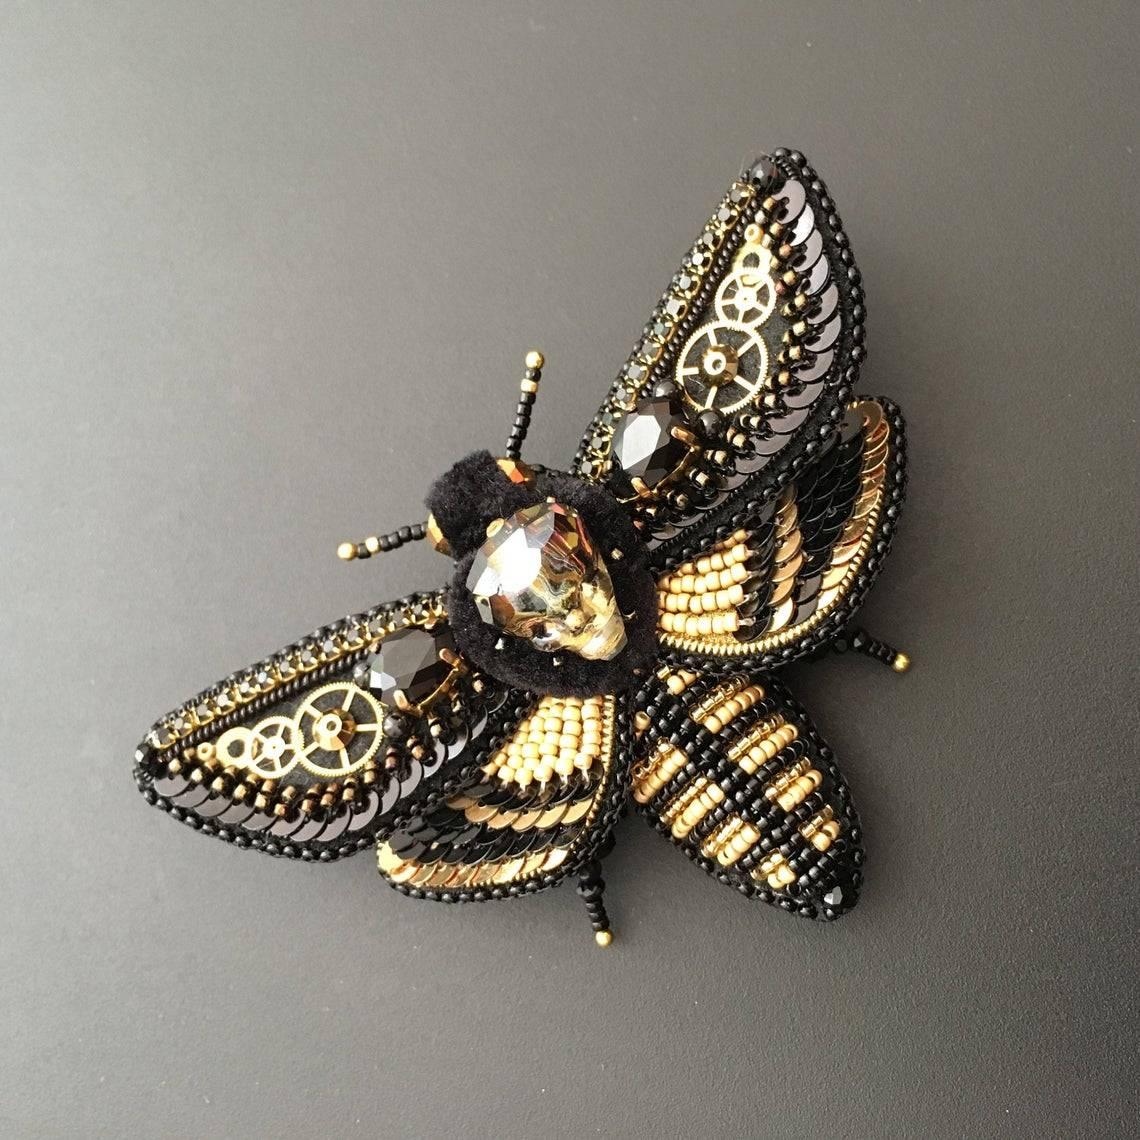 #Fashion Awesome of the Day: #Steampunk ⚙️ Black & Gold Wasp 🐝 #Brooch via @nuriacbotey #SamaFashion  👕